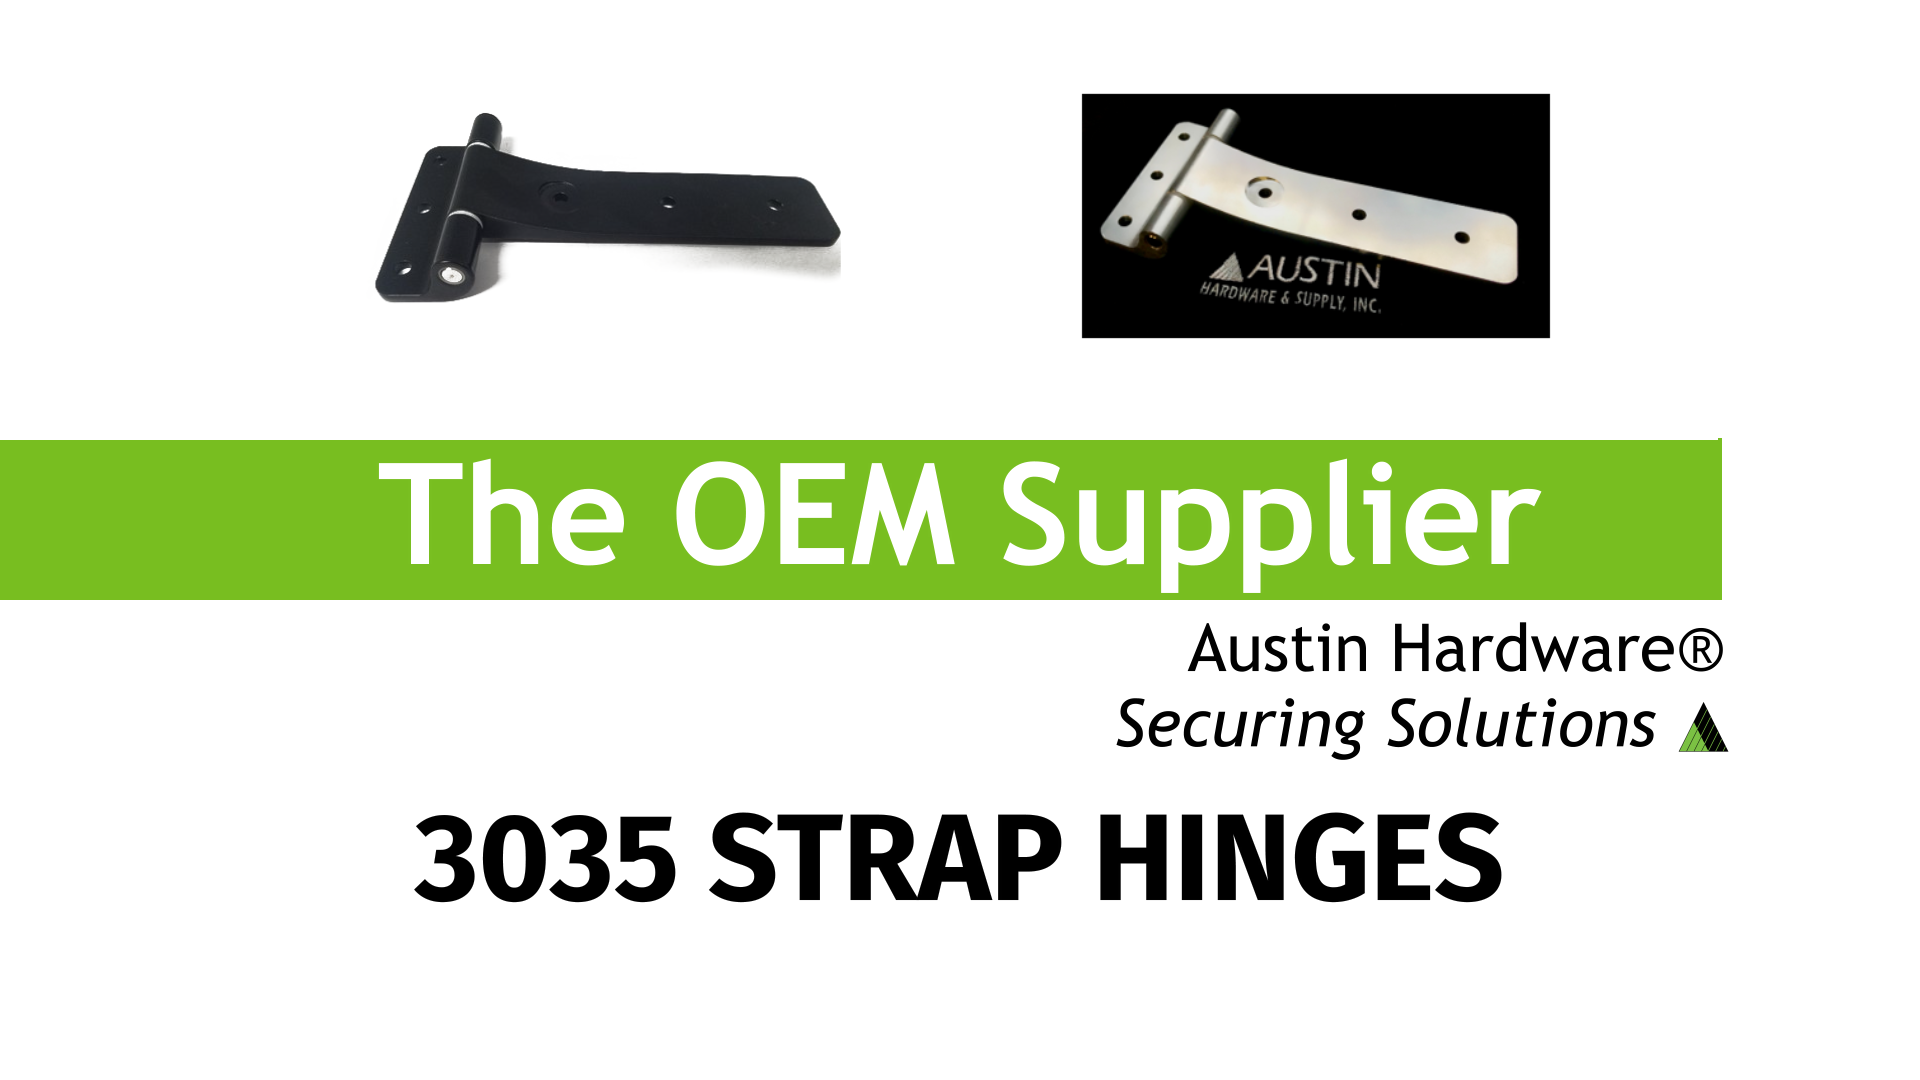 3035 Strap Hinges - Austin Hardware®